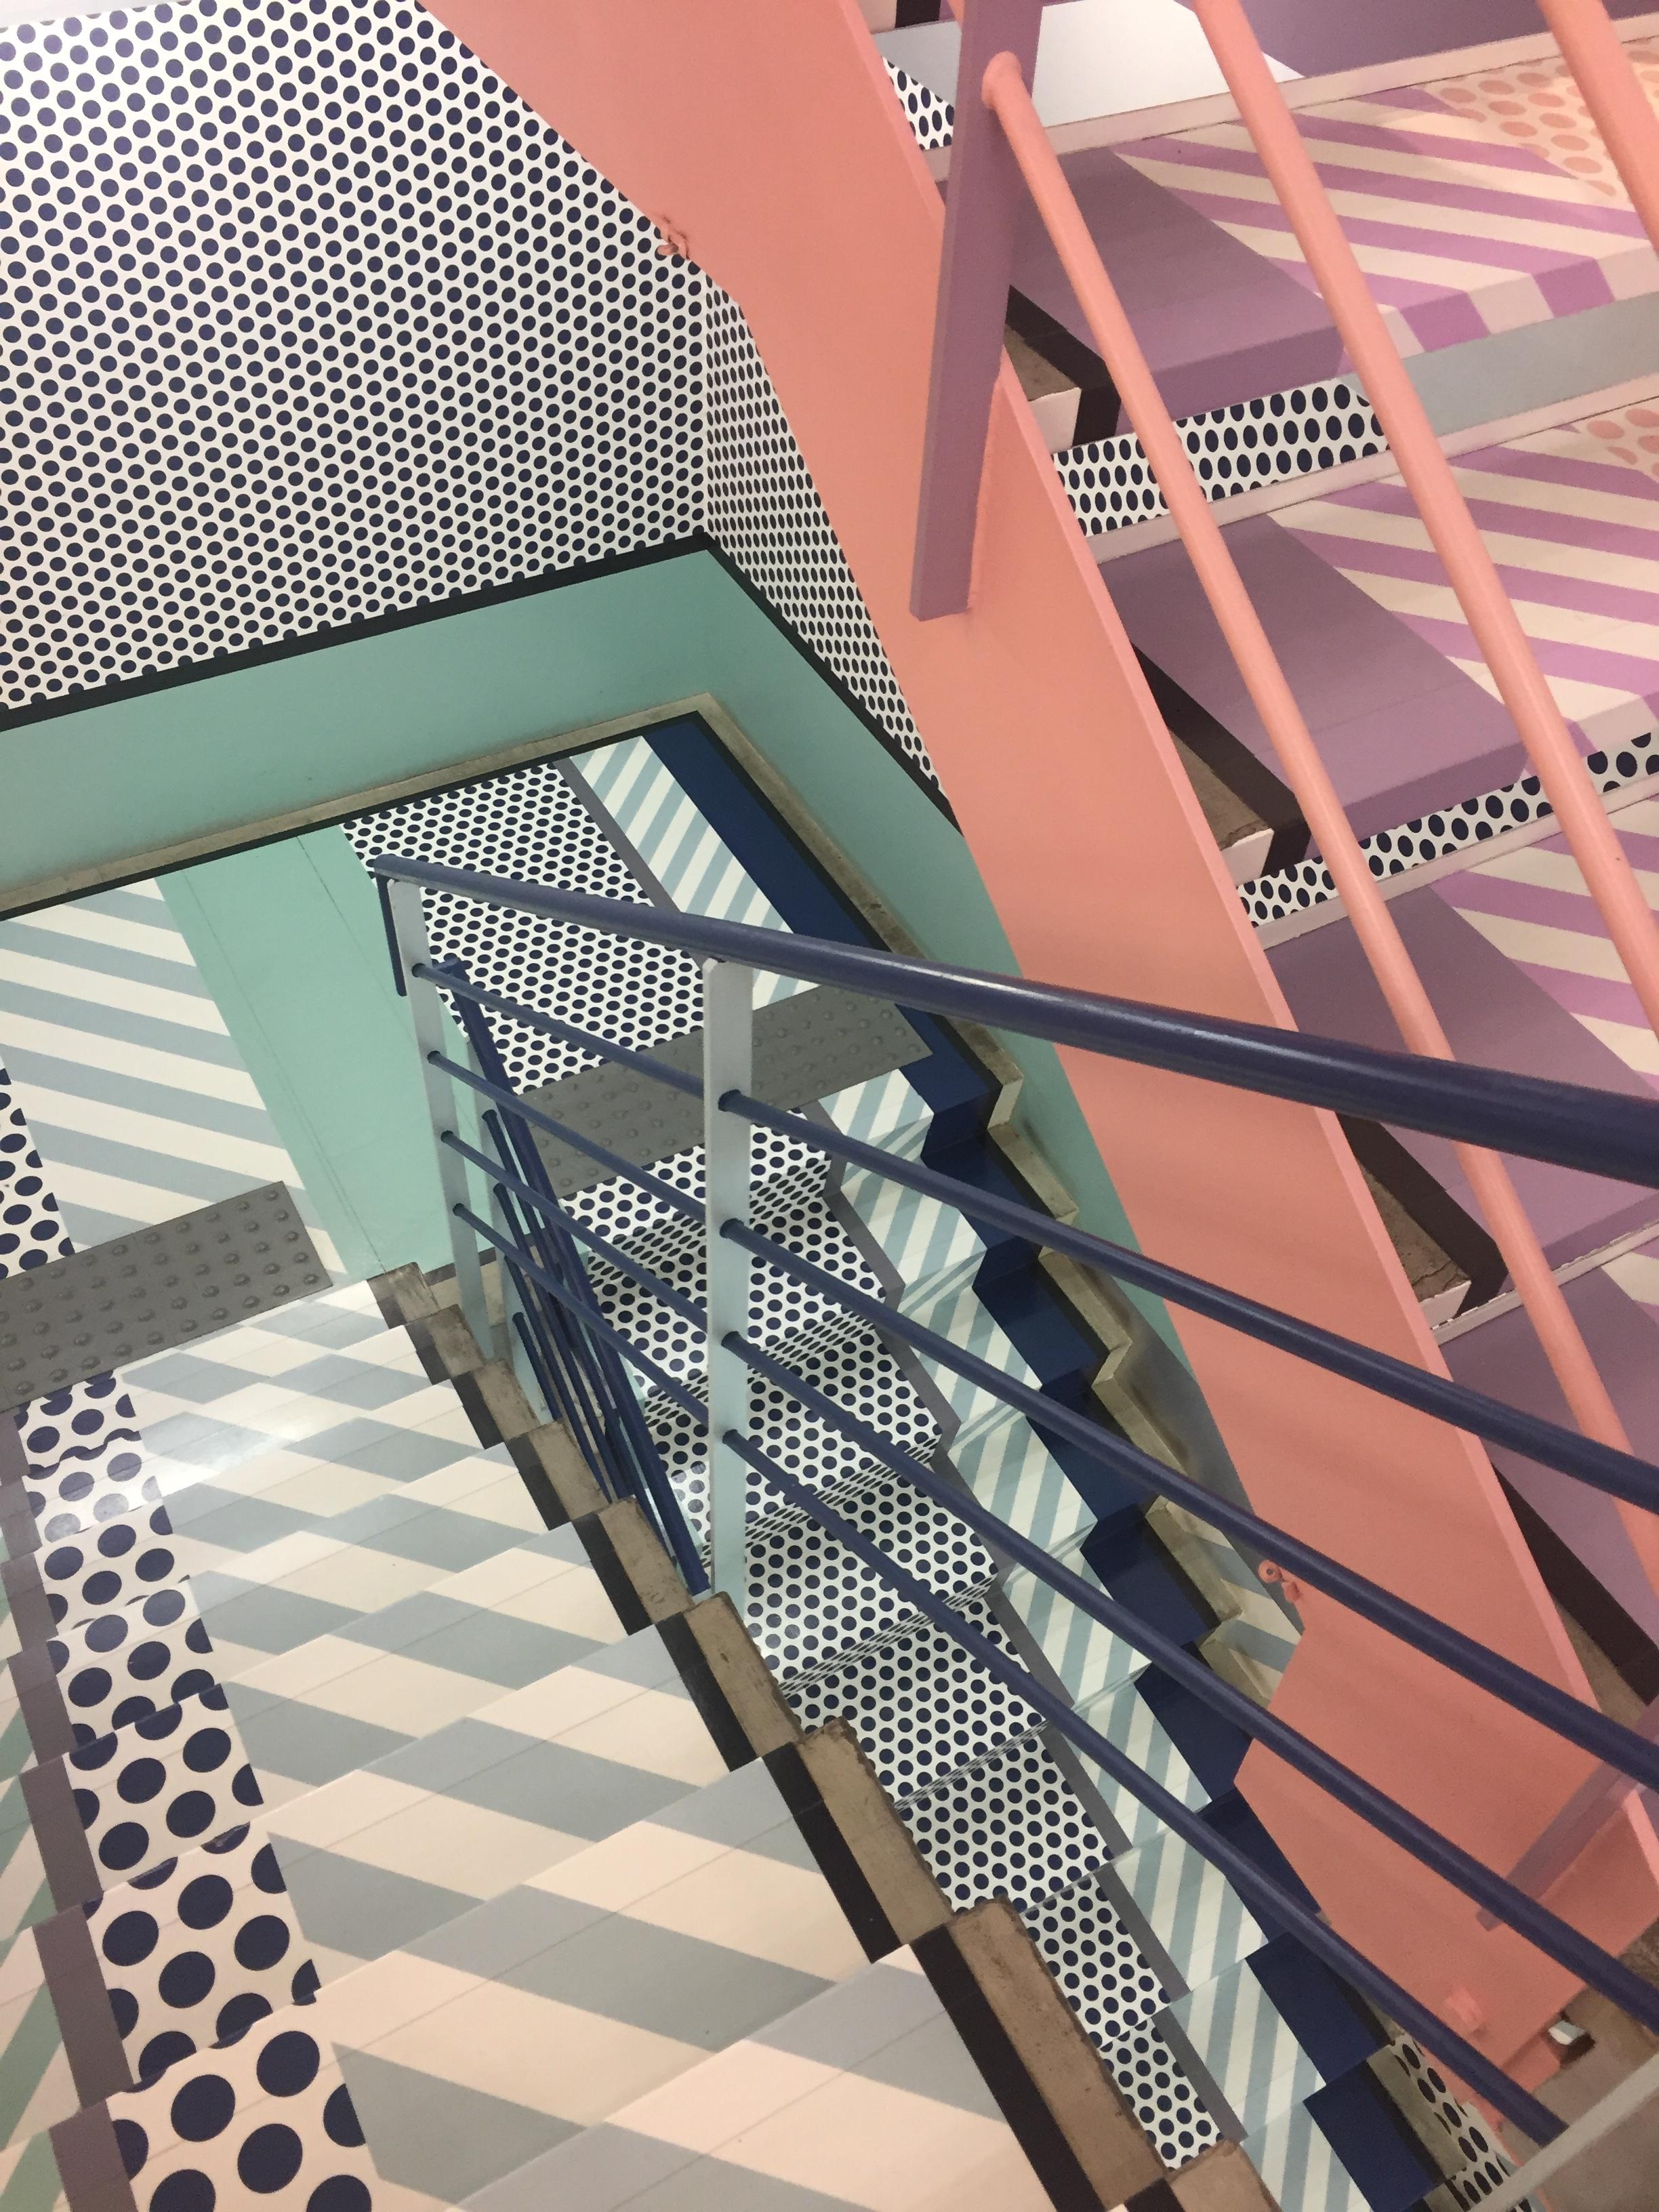 BEAUTIFUL staircase, Opening Ceremony, Harajuku